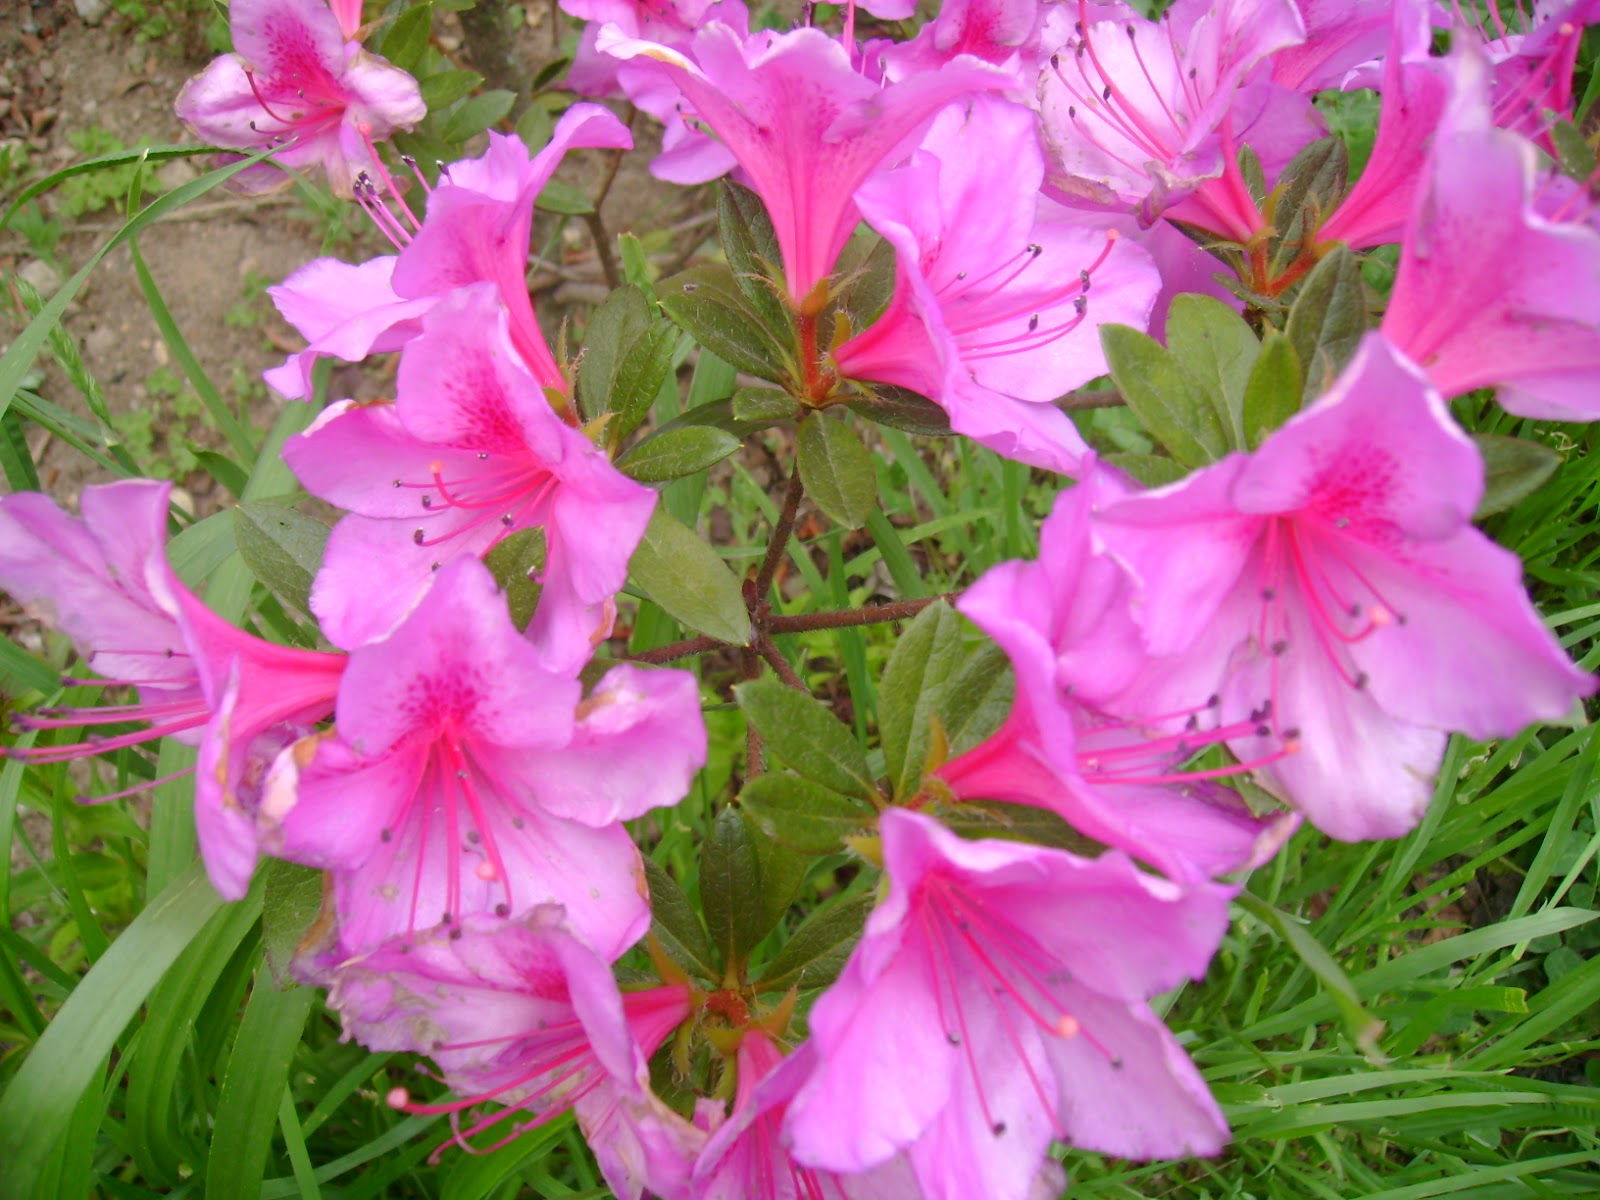 Gardentropics Flowers From Bhutan